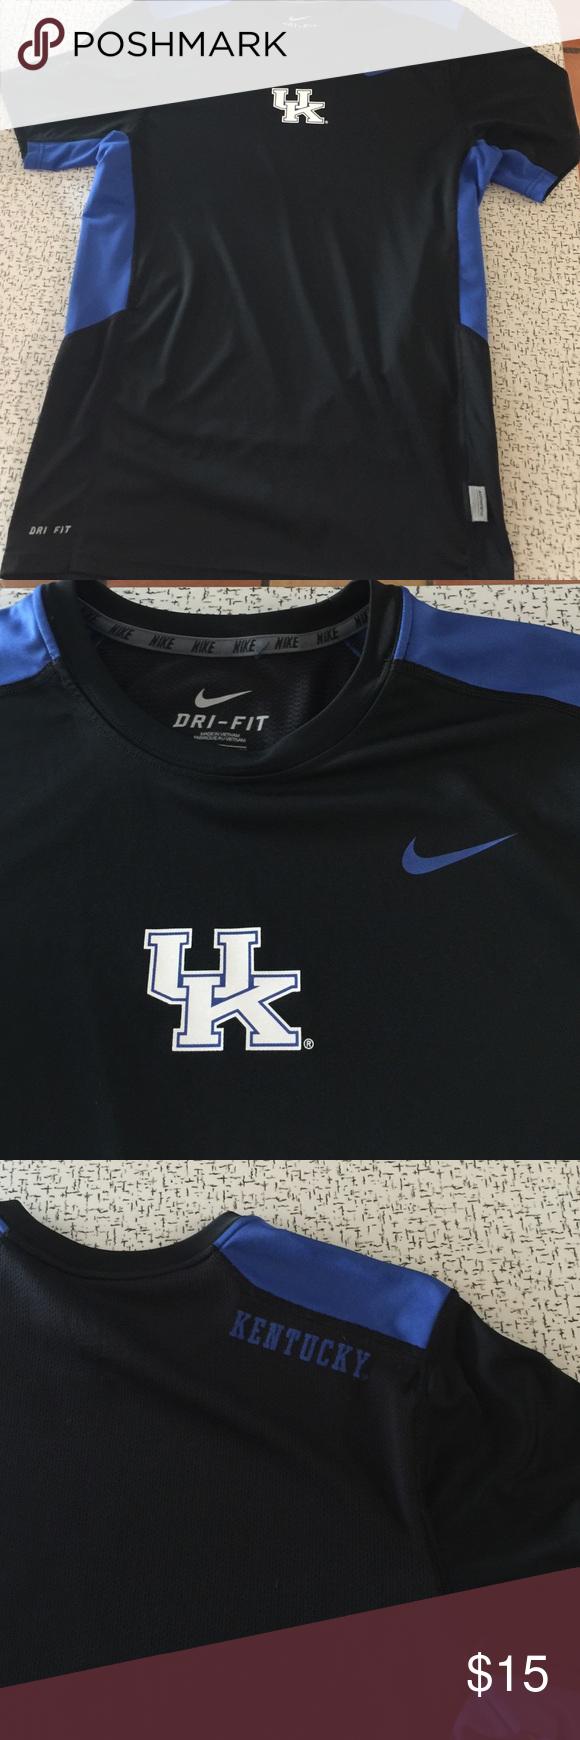 a89cb93b2 Nike Dri-Fit U of Kentucky shirt Black w blue. UK on front ...